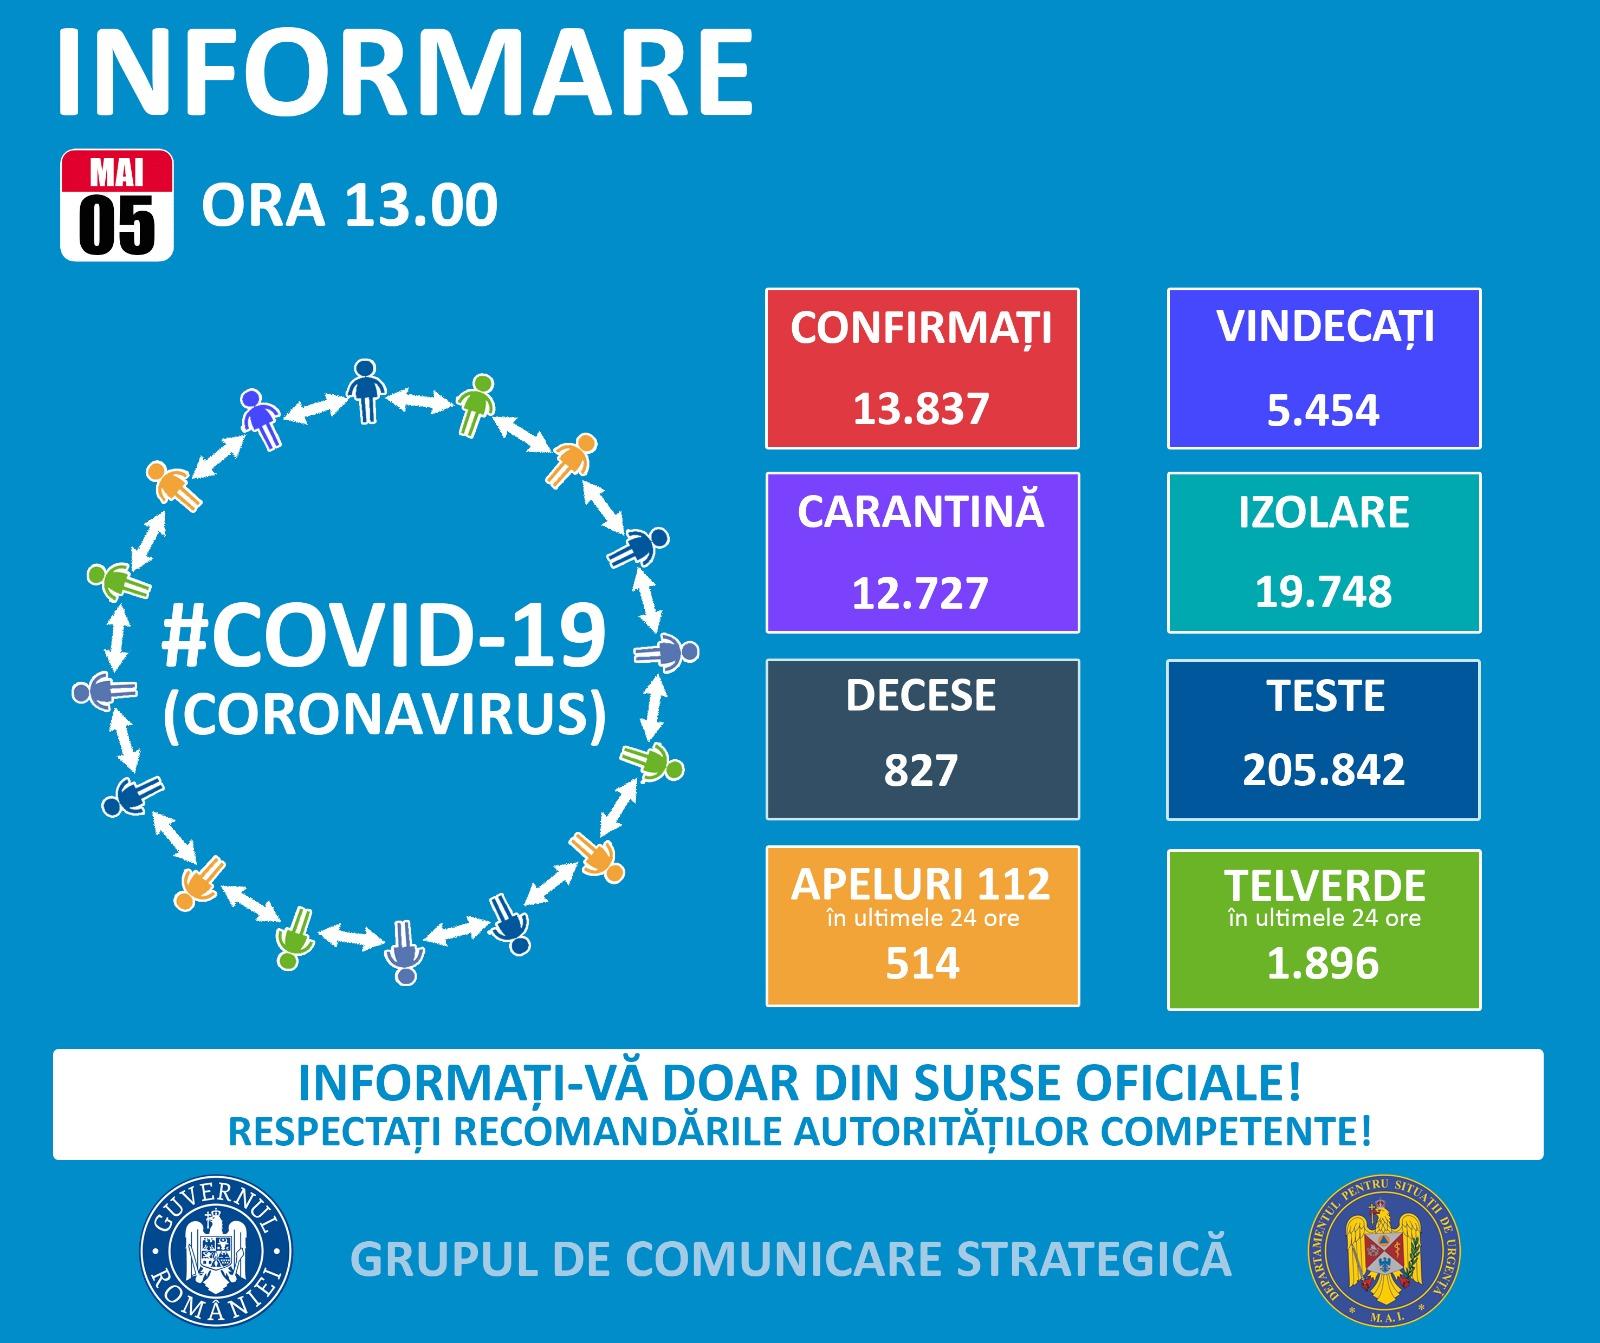 COVID-19 Romania situatie 5 mai 2020